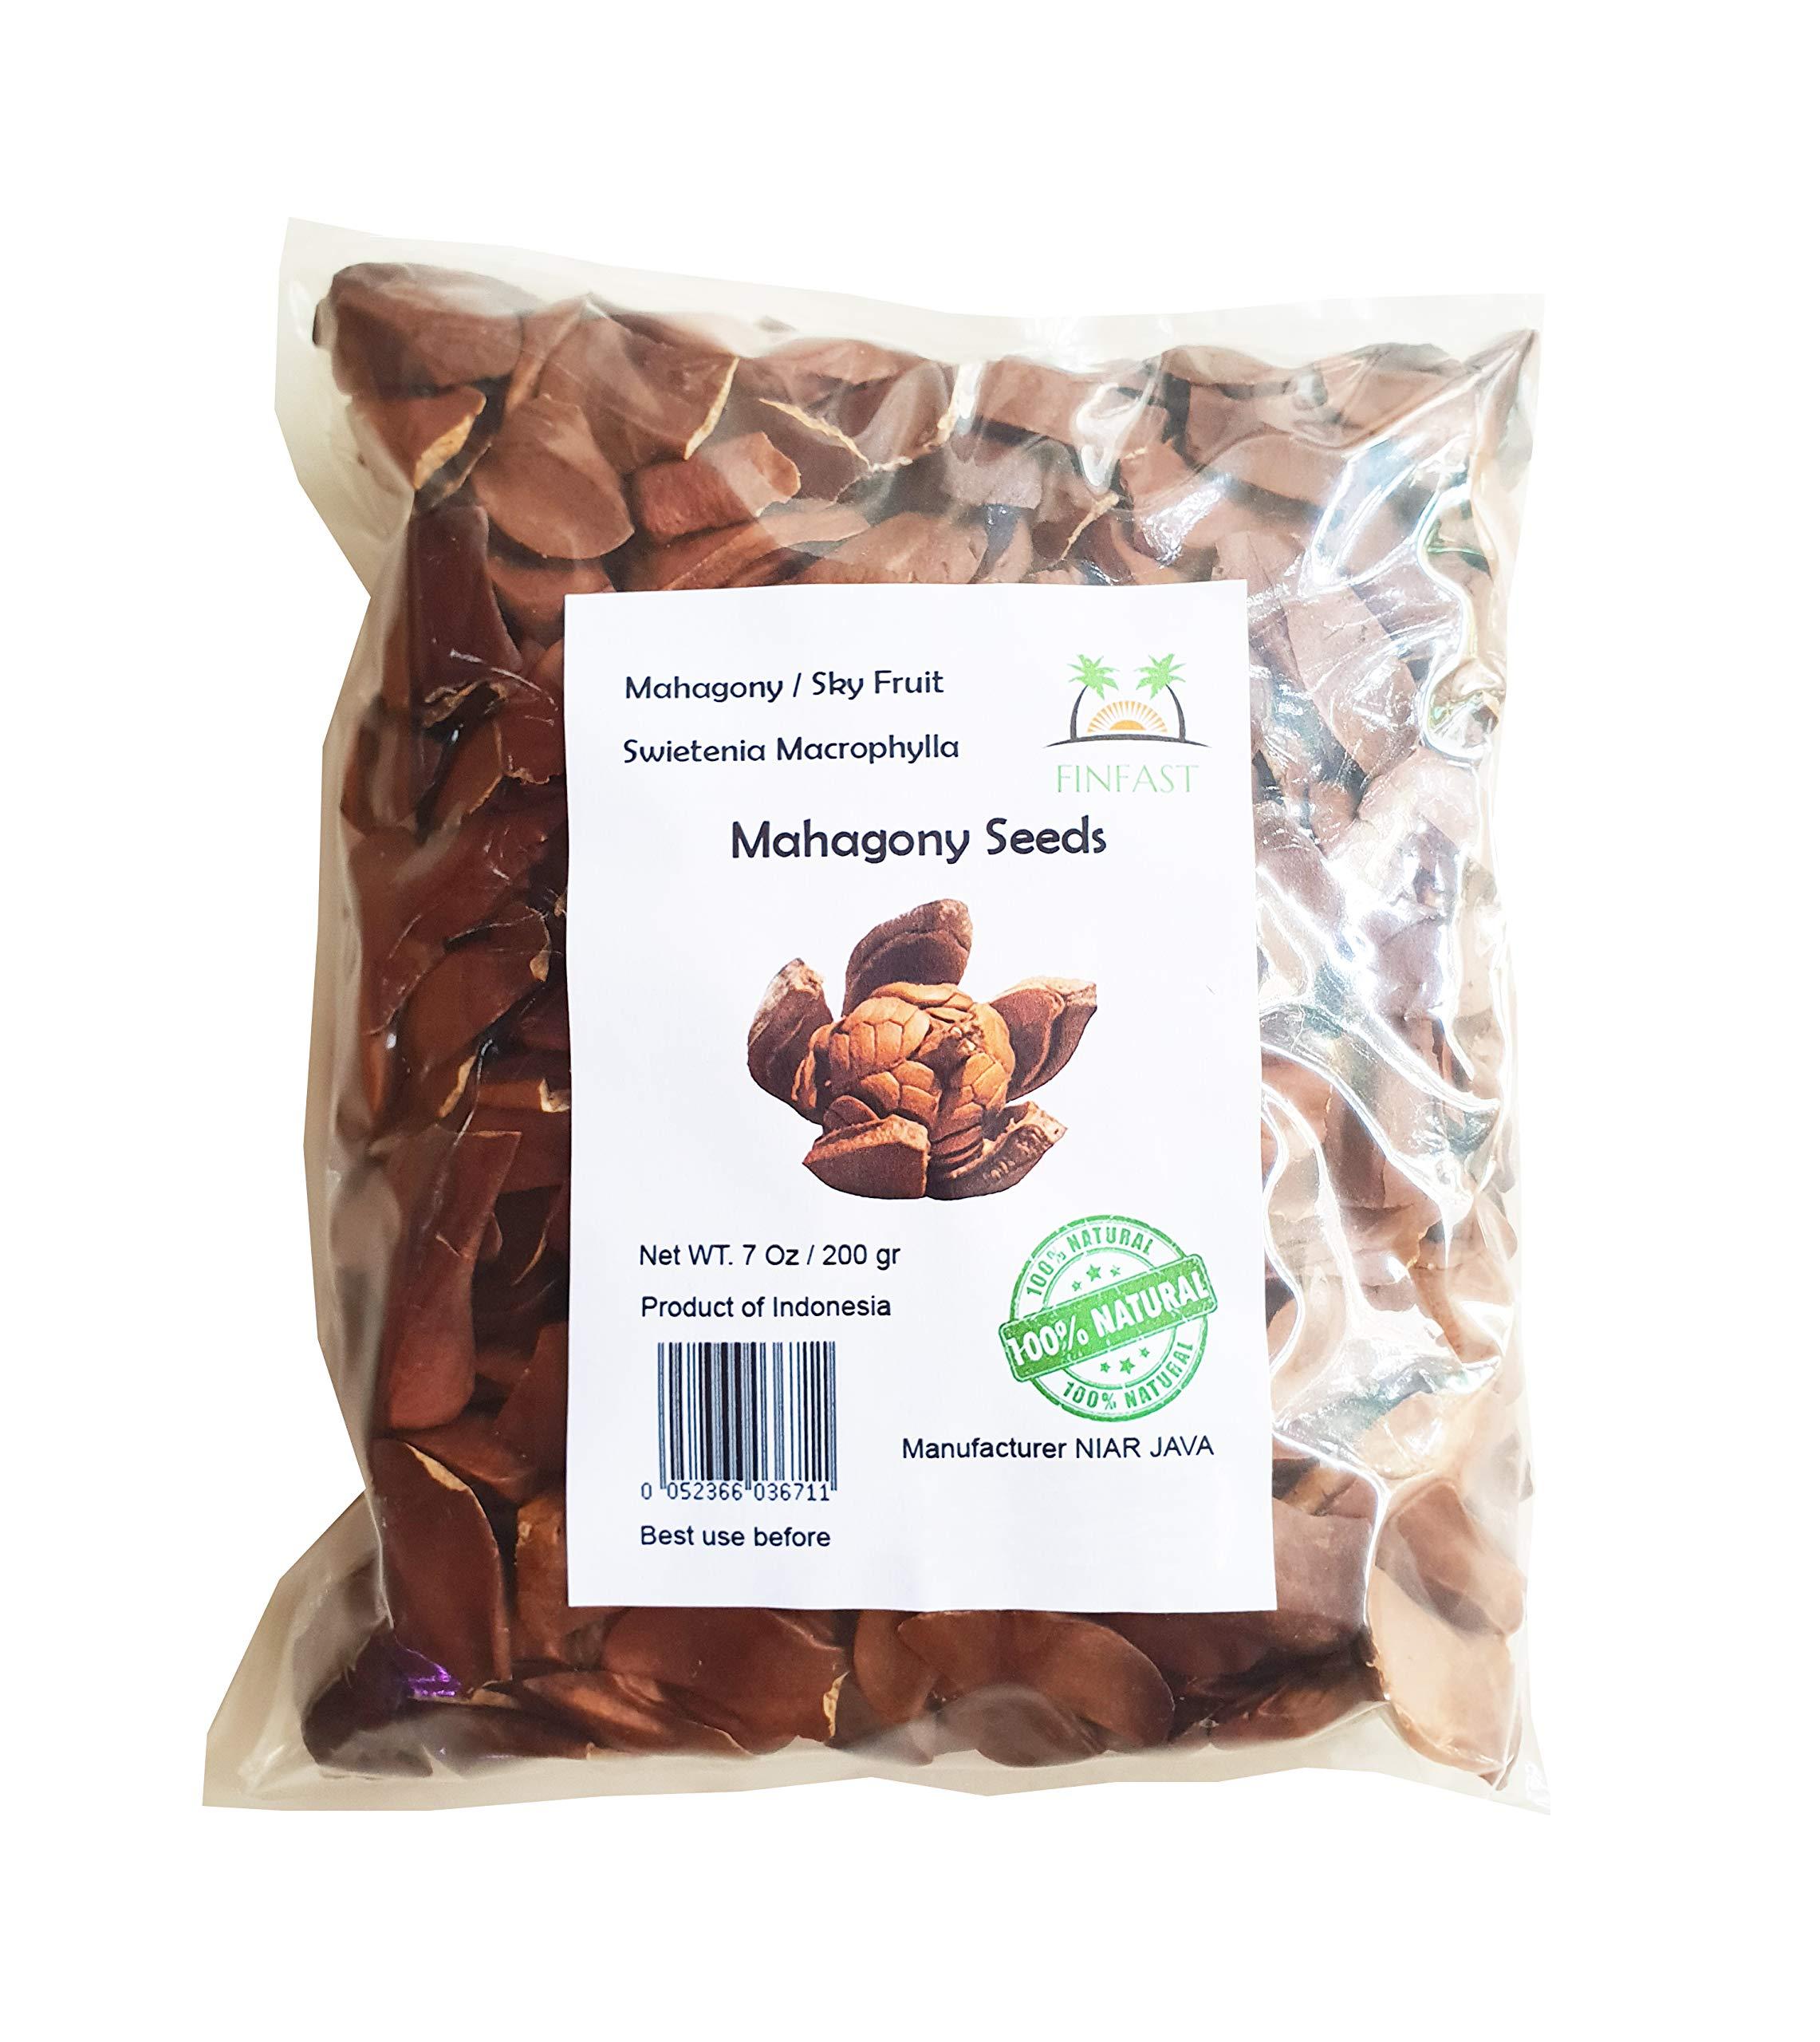 FINFAST 200 Grams Mahagony Seeds (Swietenia Macrophylla)